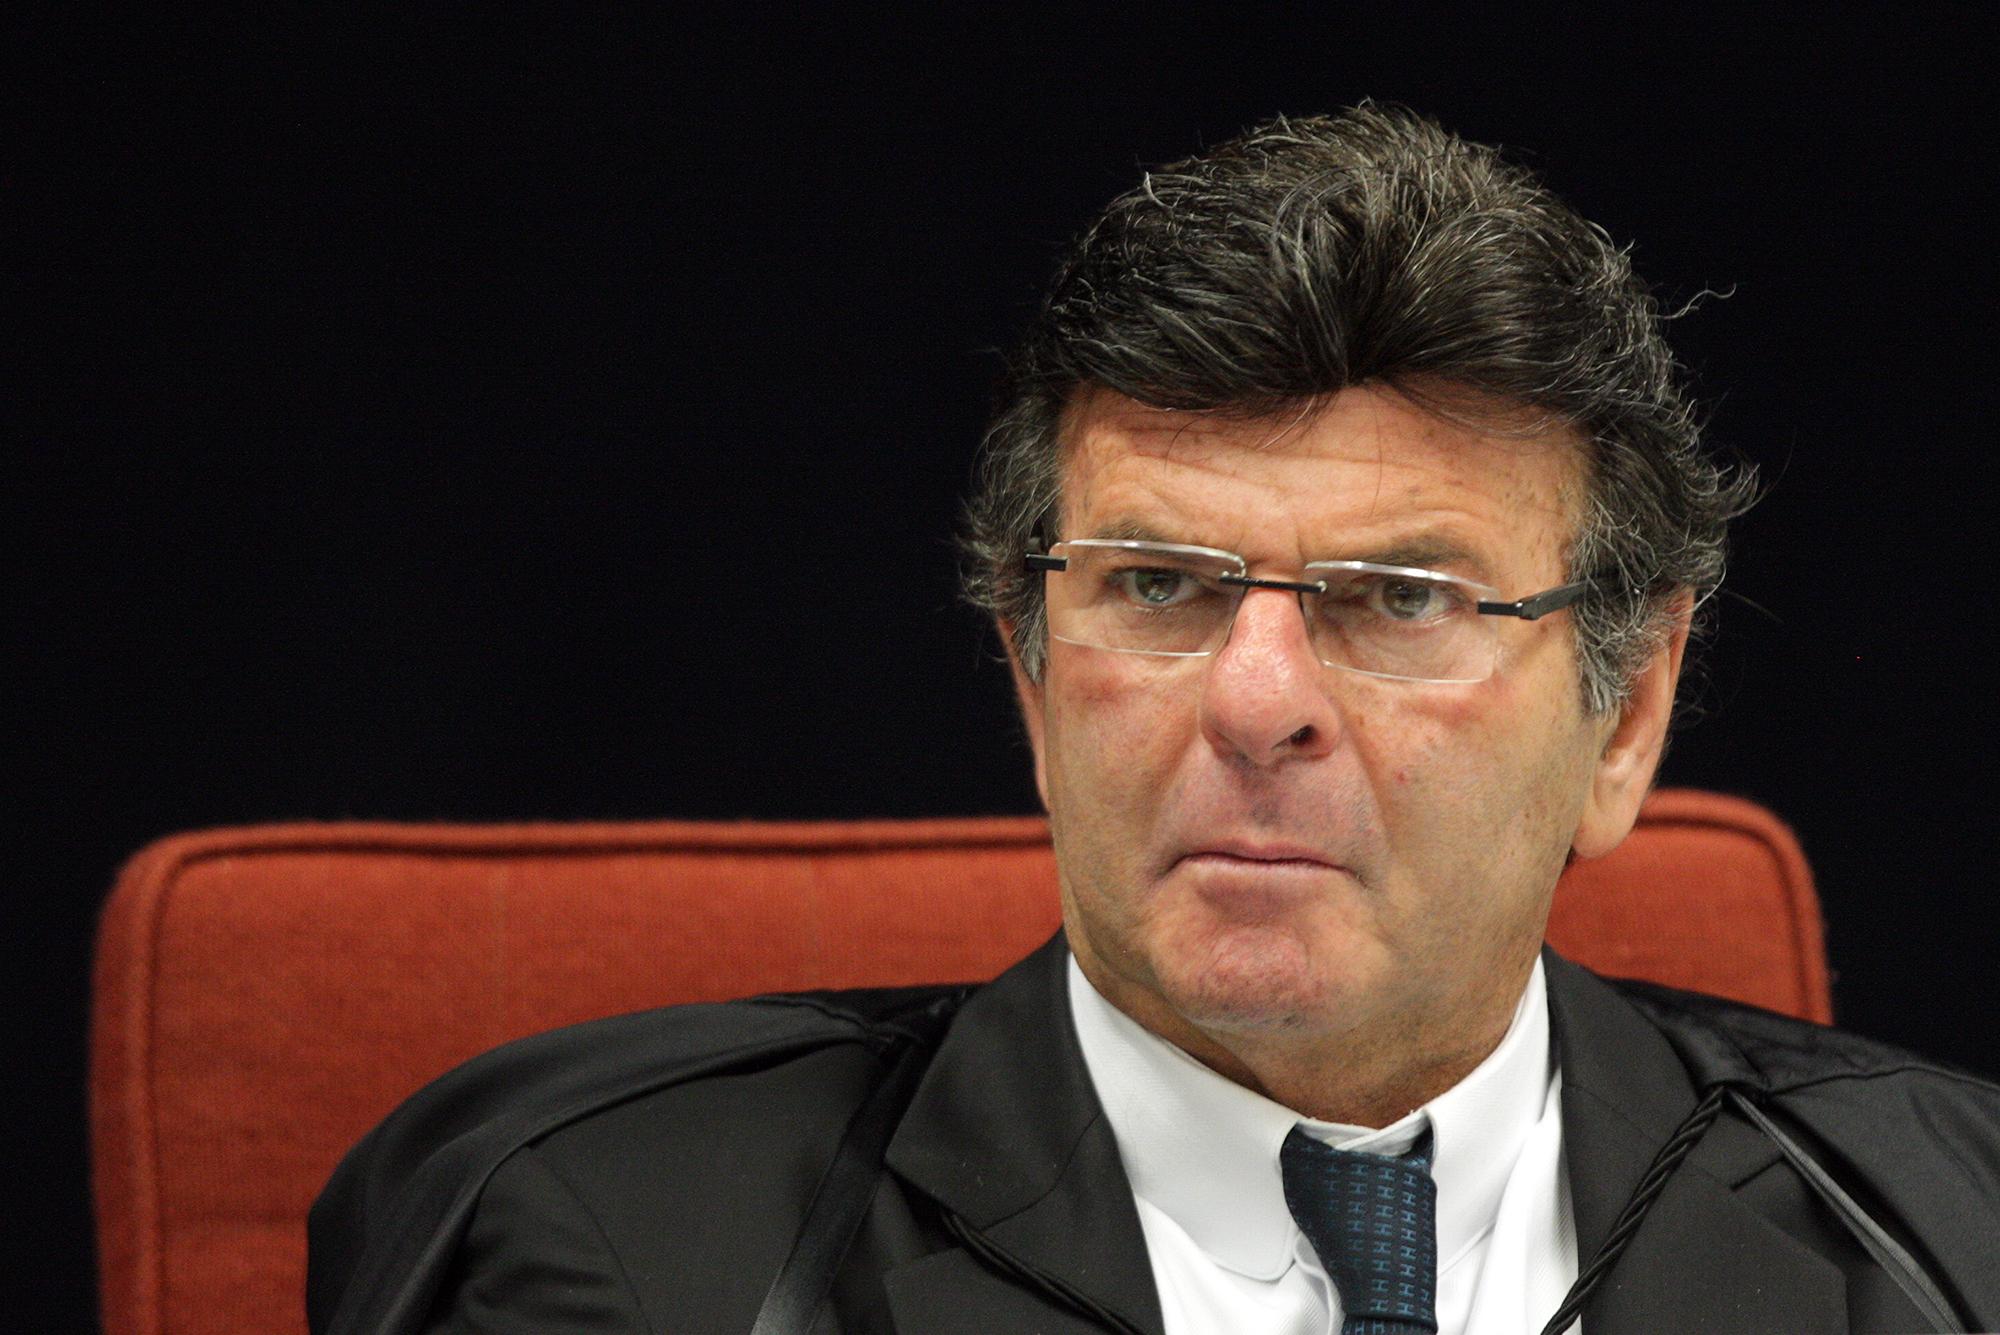 Ministro do Supremo Tribunal Federal Luiz Fux